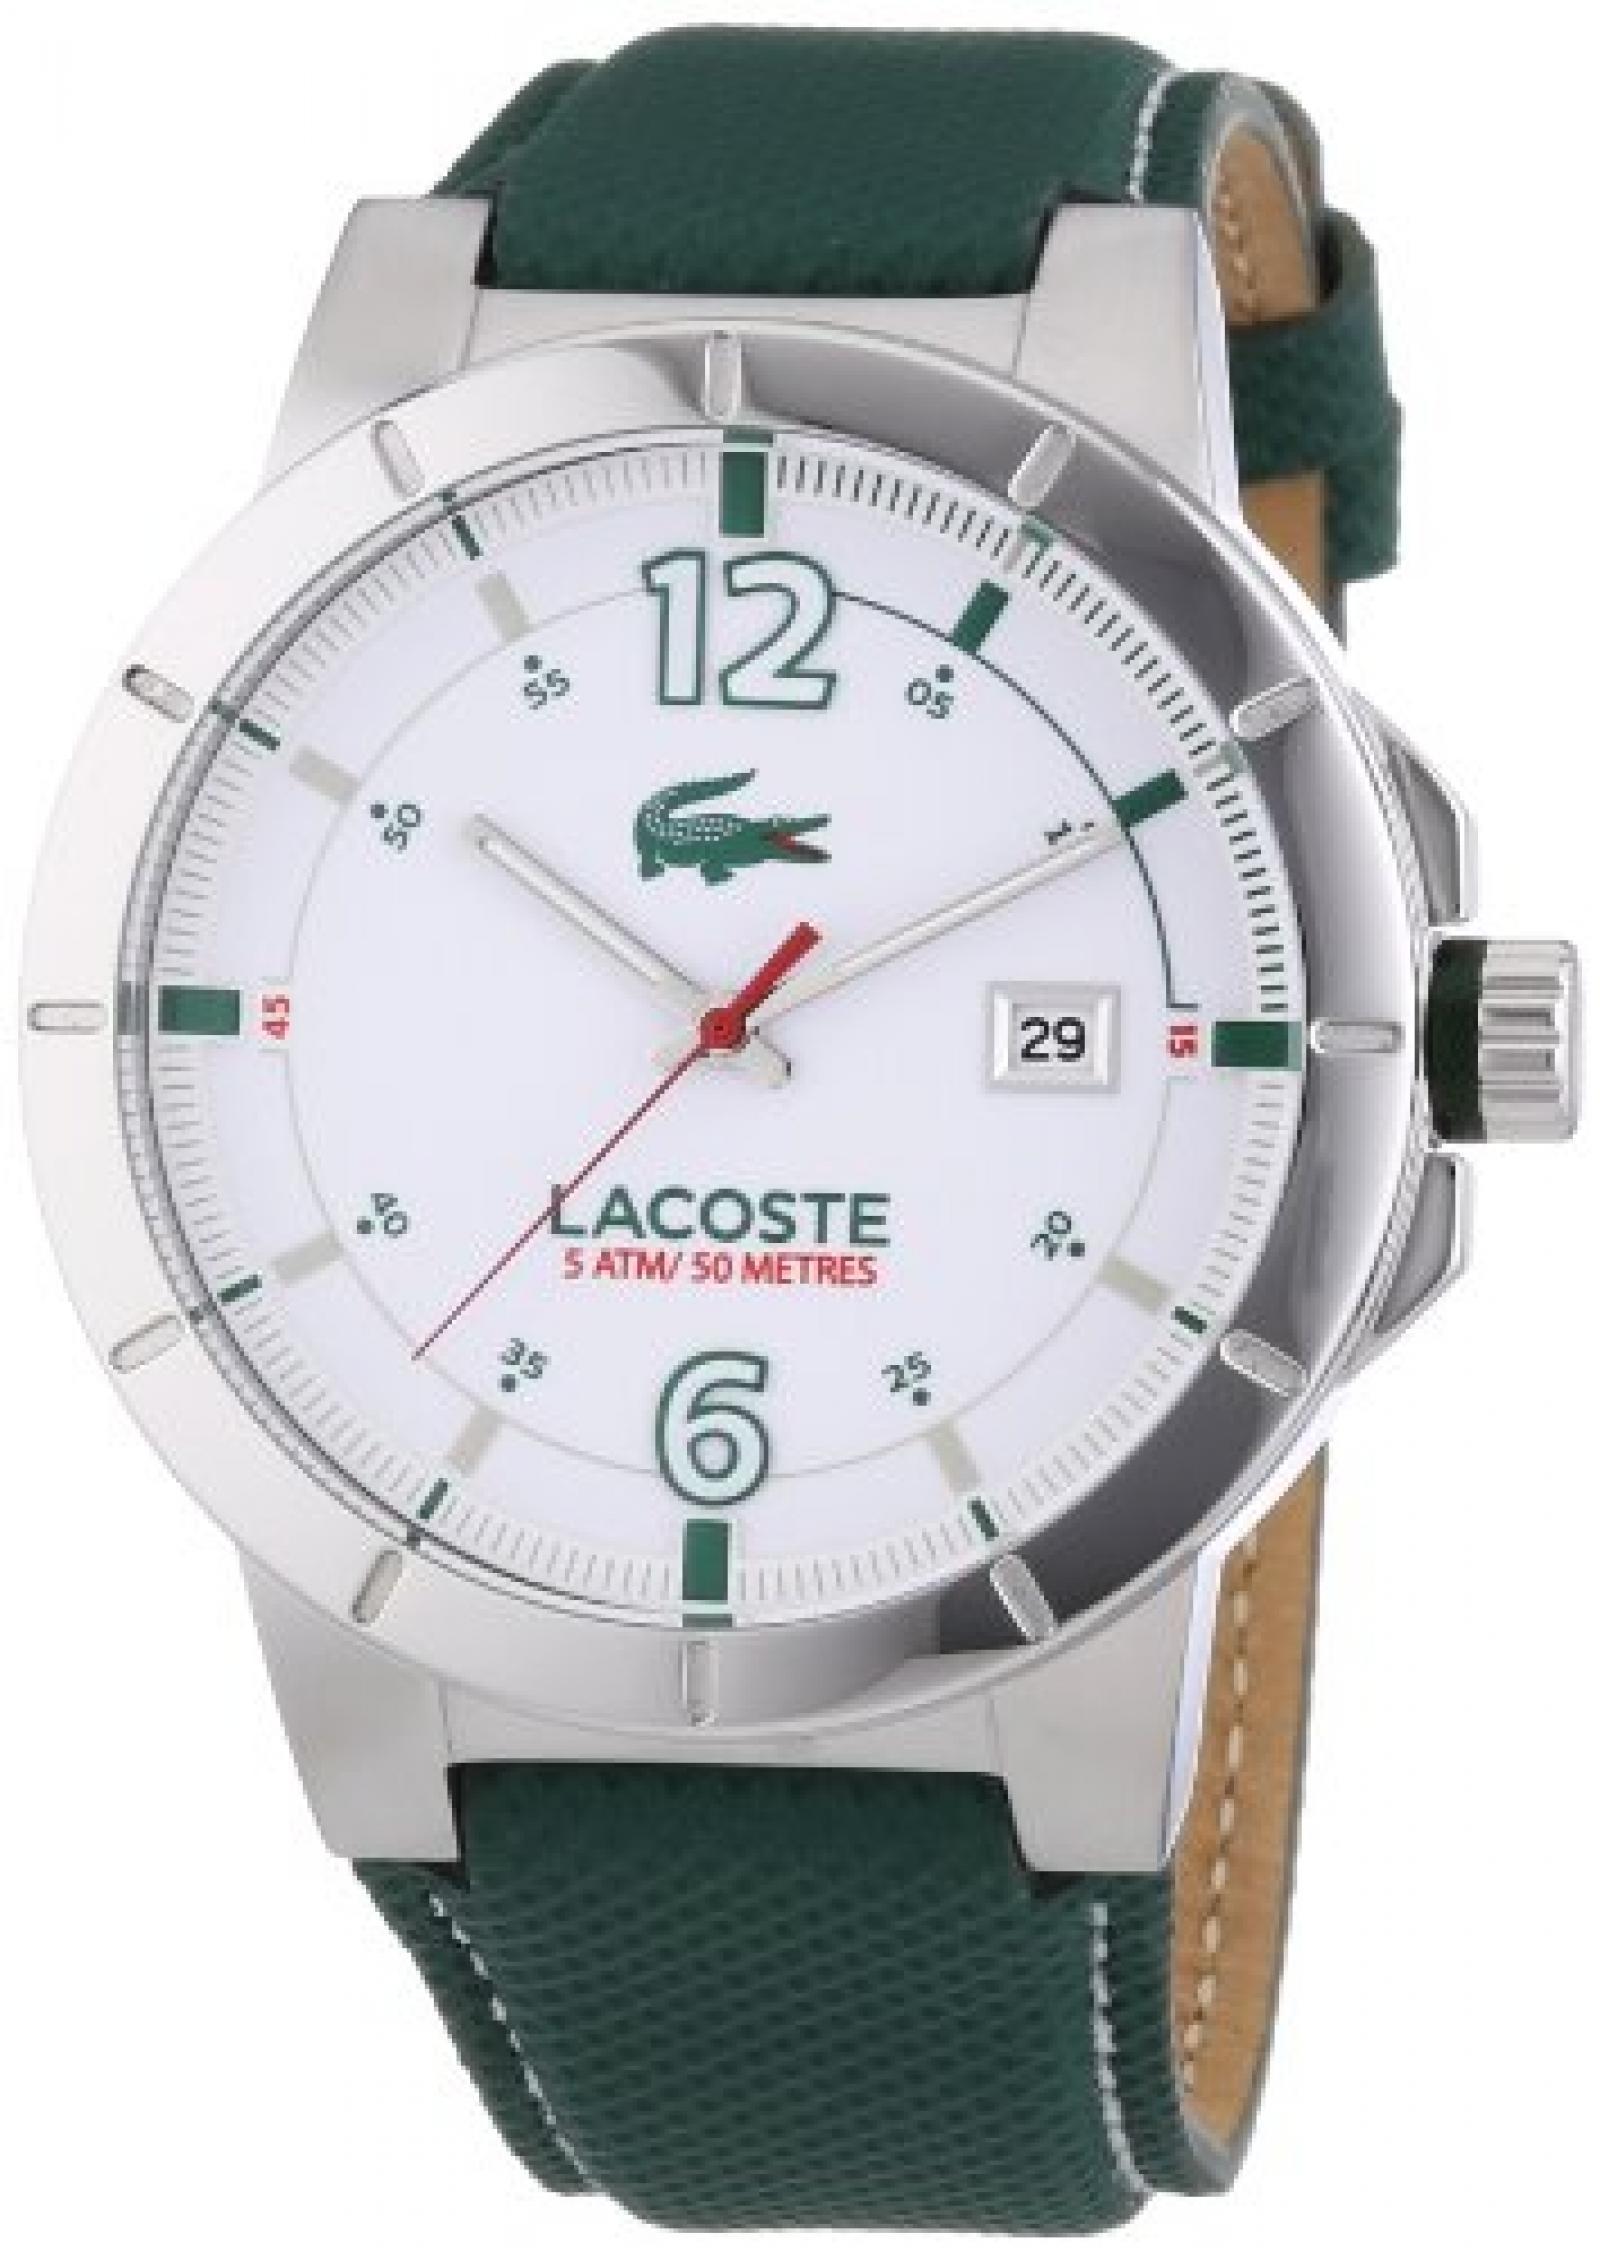 Lacoste Herren-Armbanduhr XL Darwin Analog Quarz Leder 2010726